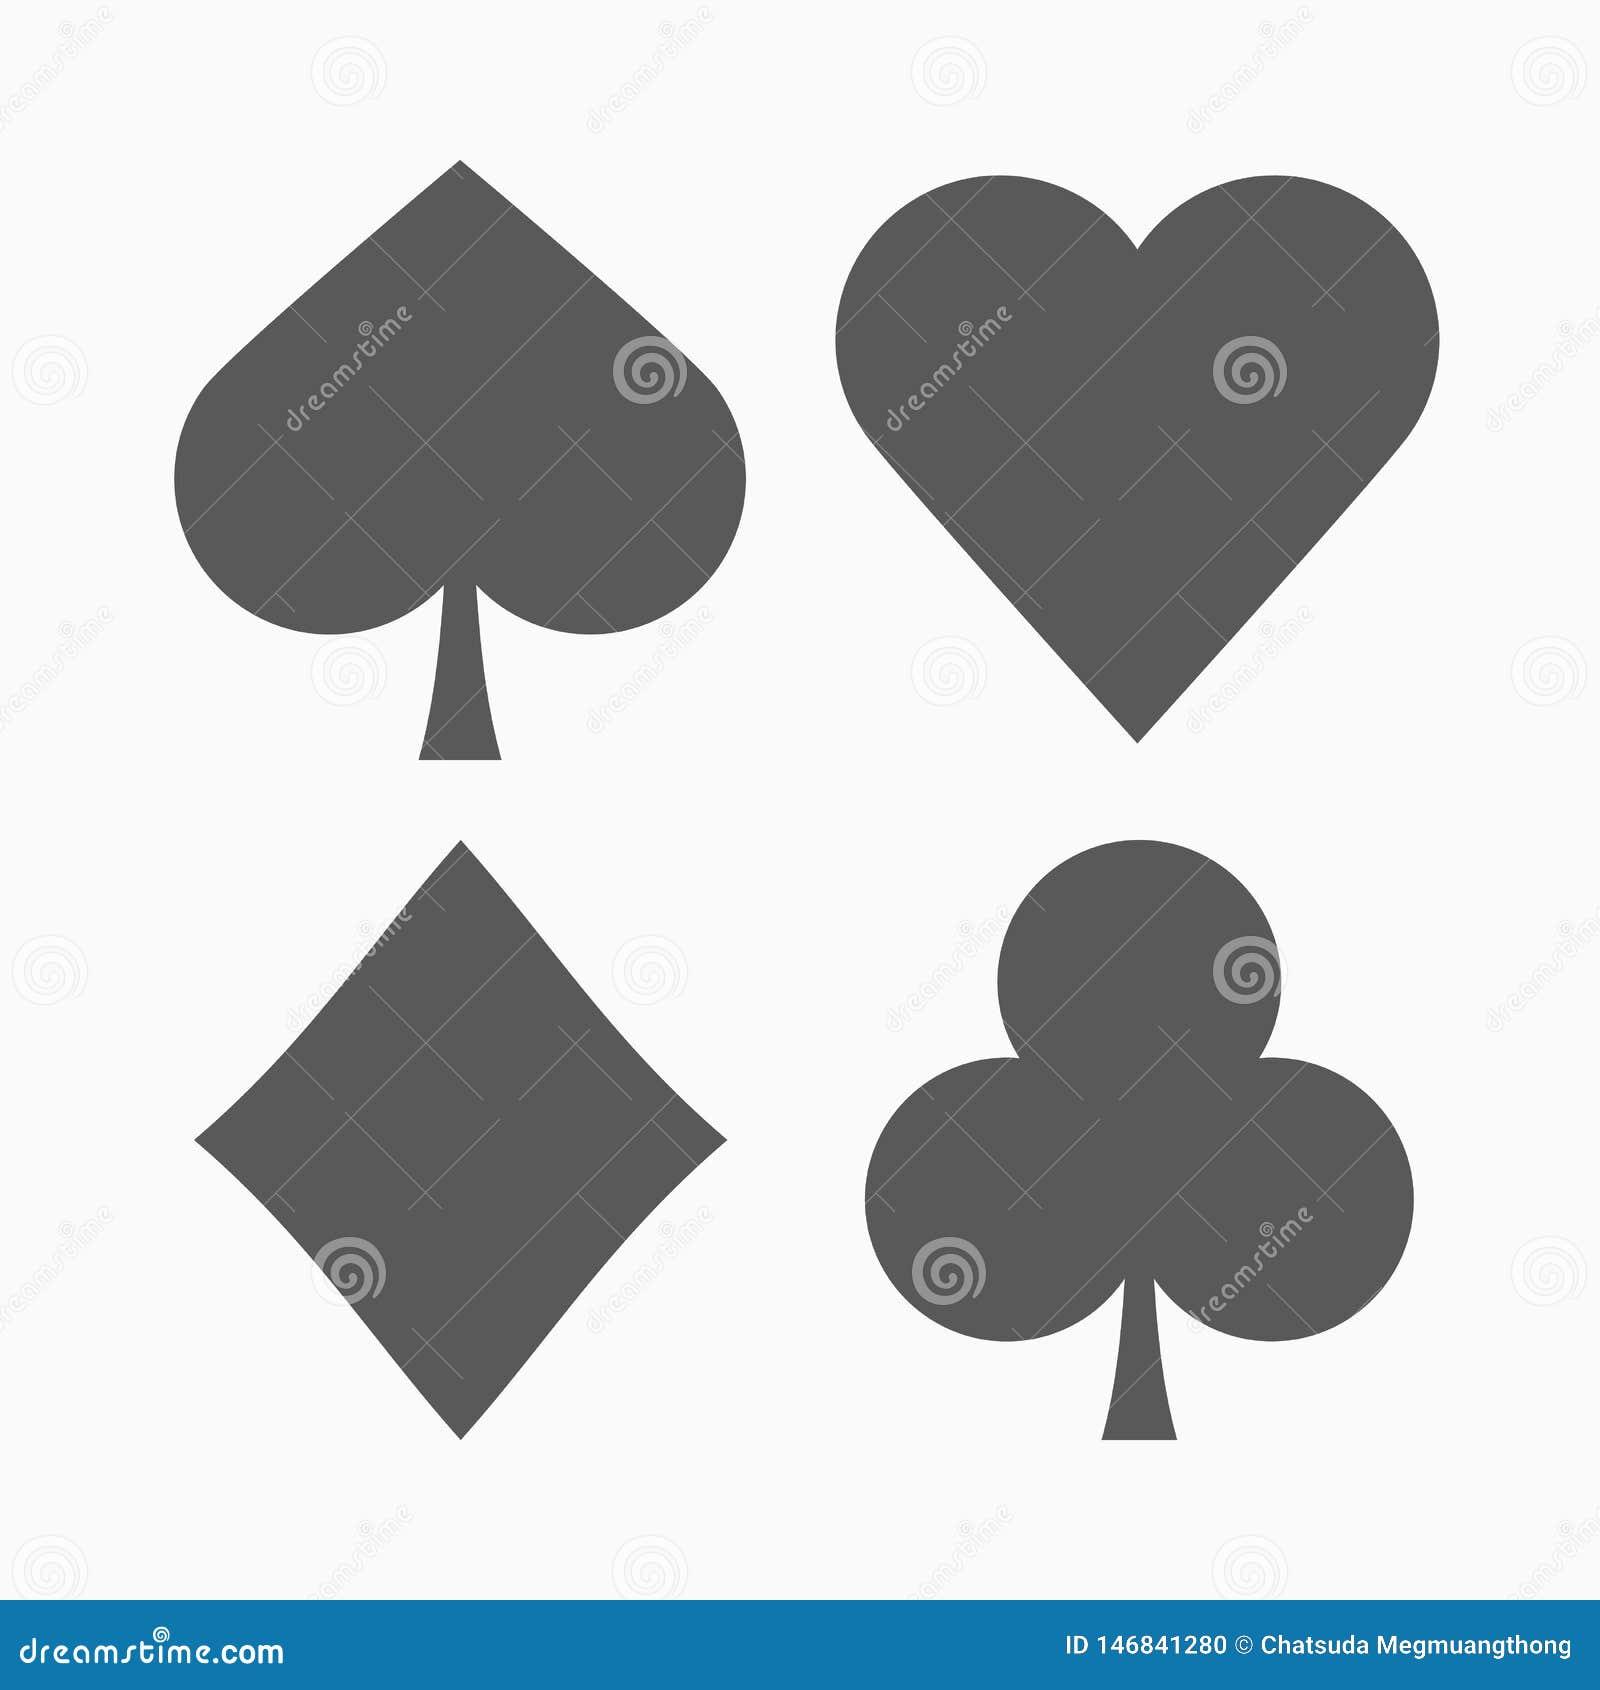 Play card icon, gambling, casino, poker